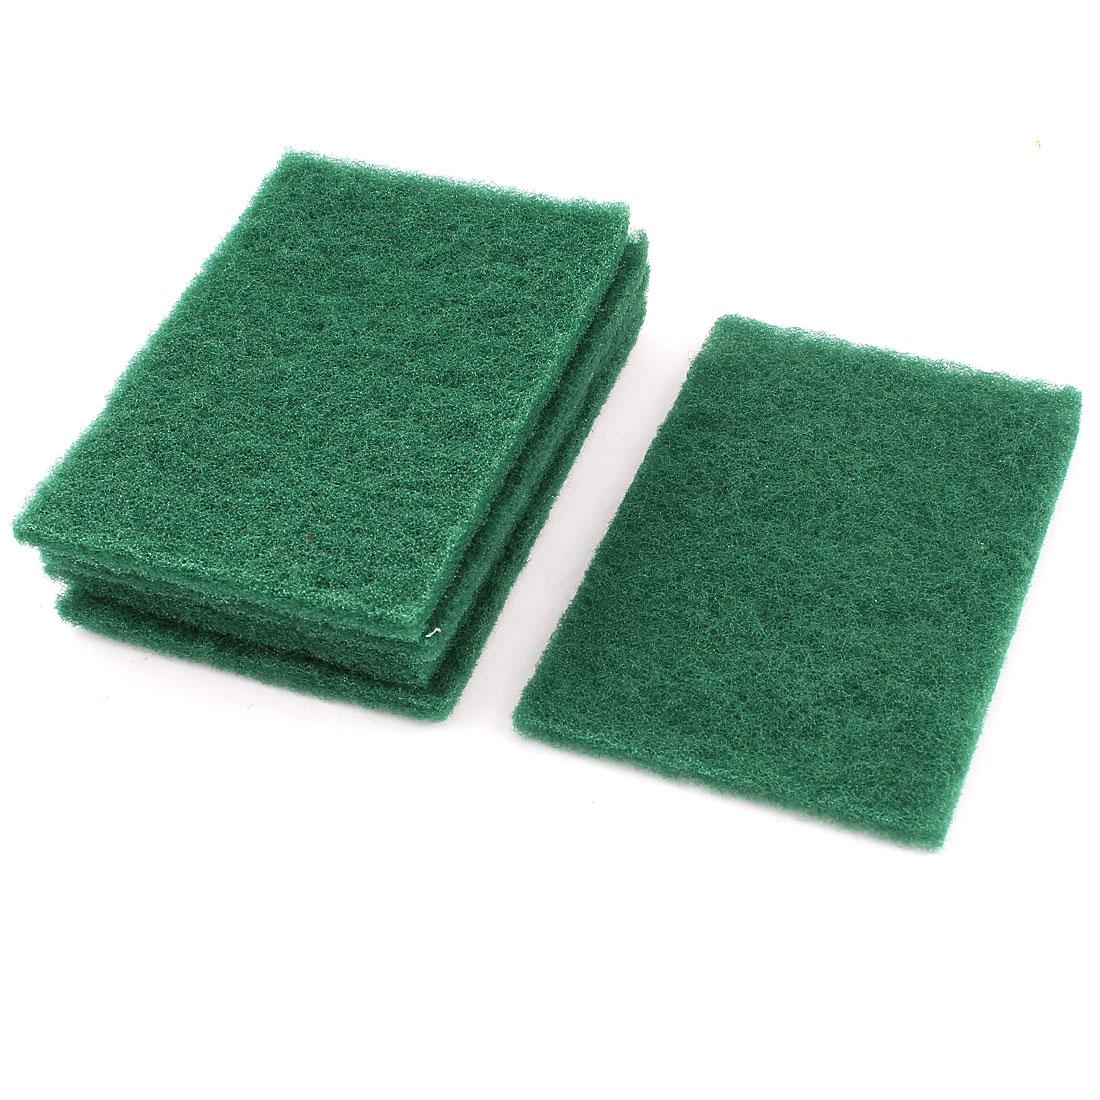 Home Kitchen Bowl Dish Wash Clean Scrub Sponge Cleaning Pads Green 5pcs